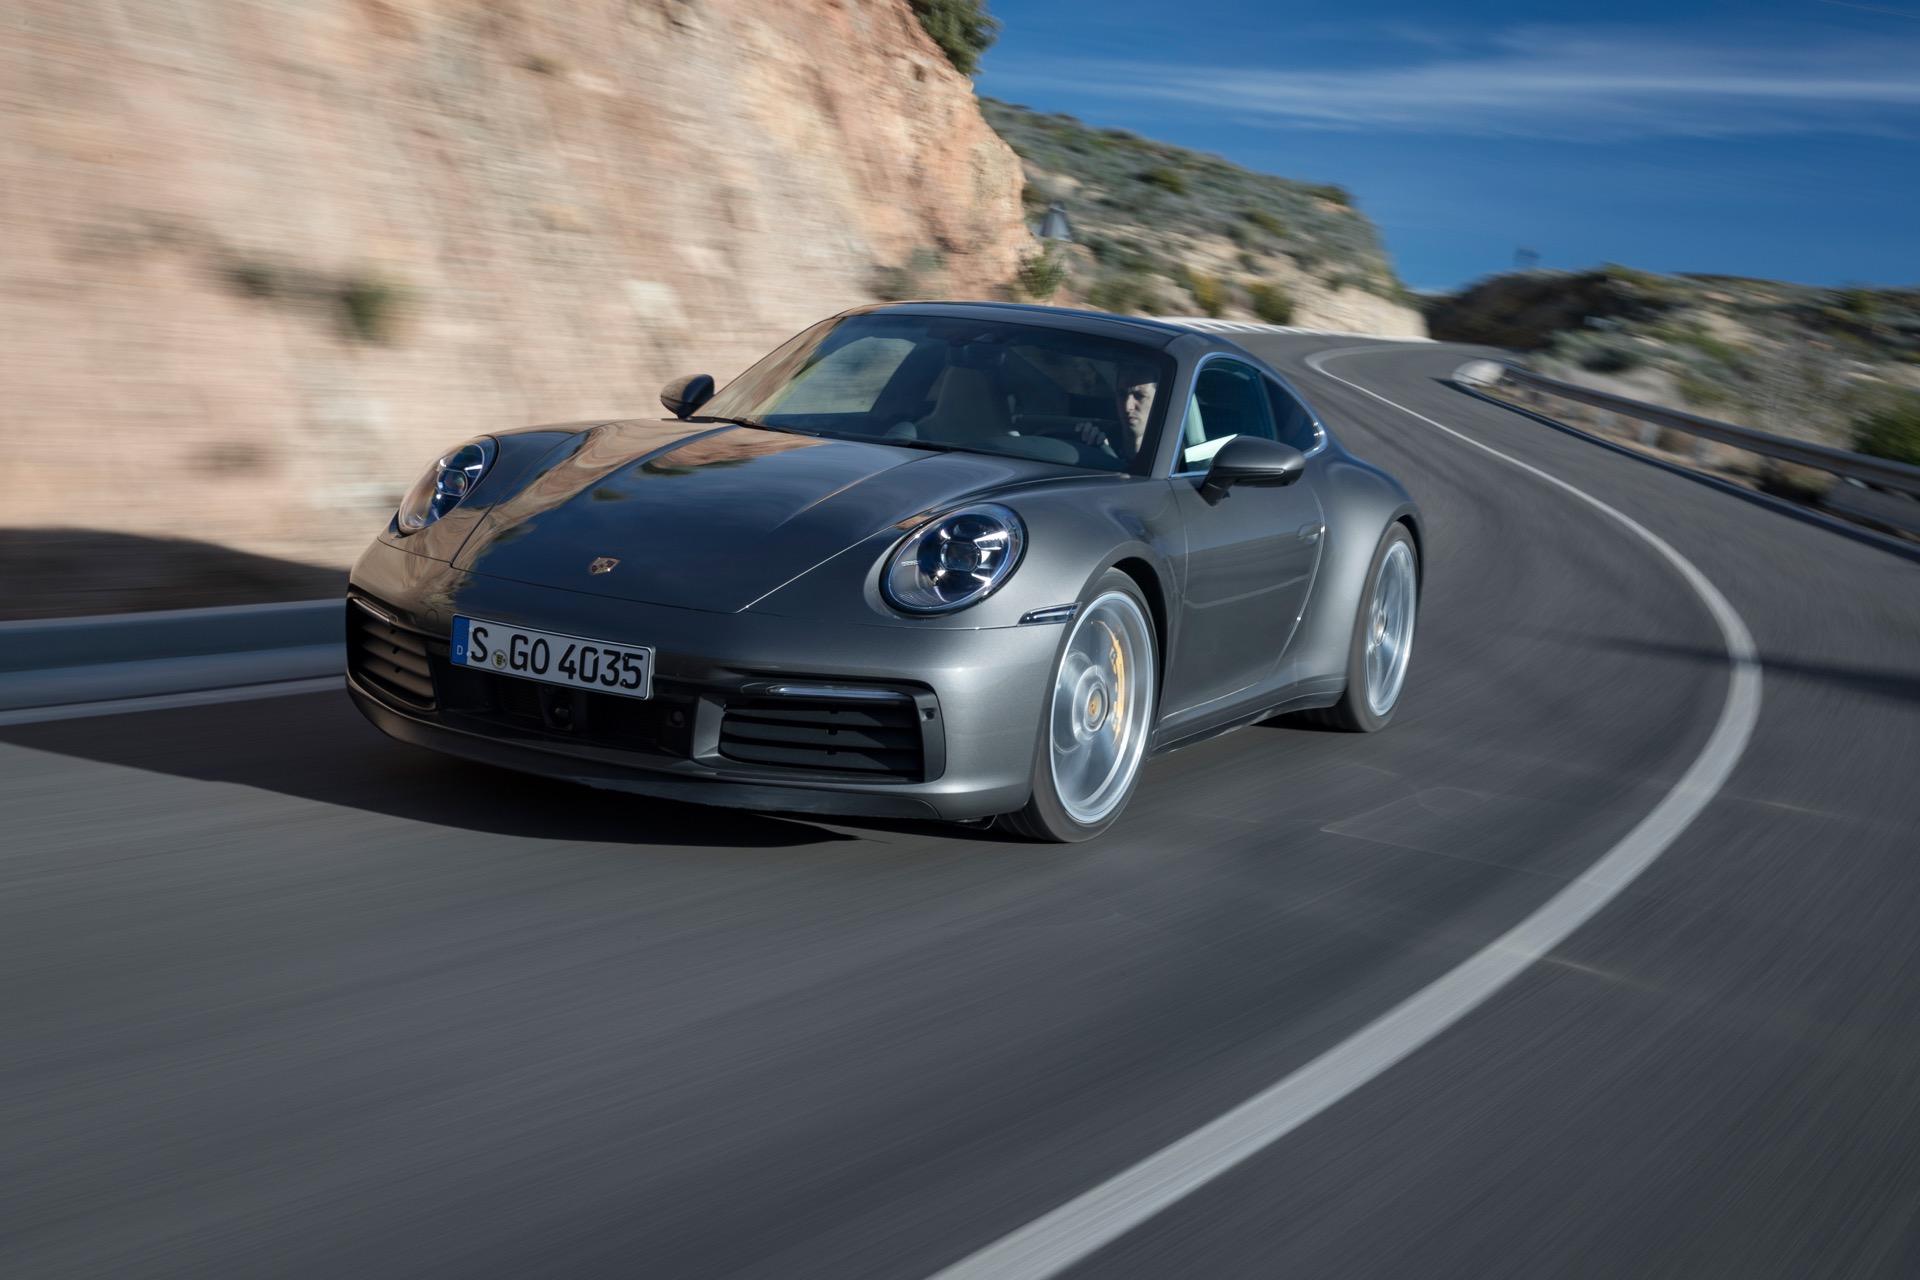 Porsche 911 992 Carrera S 00004